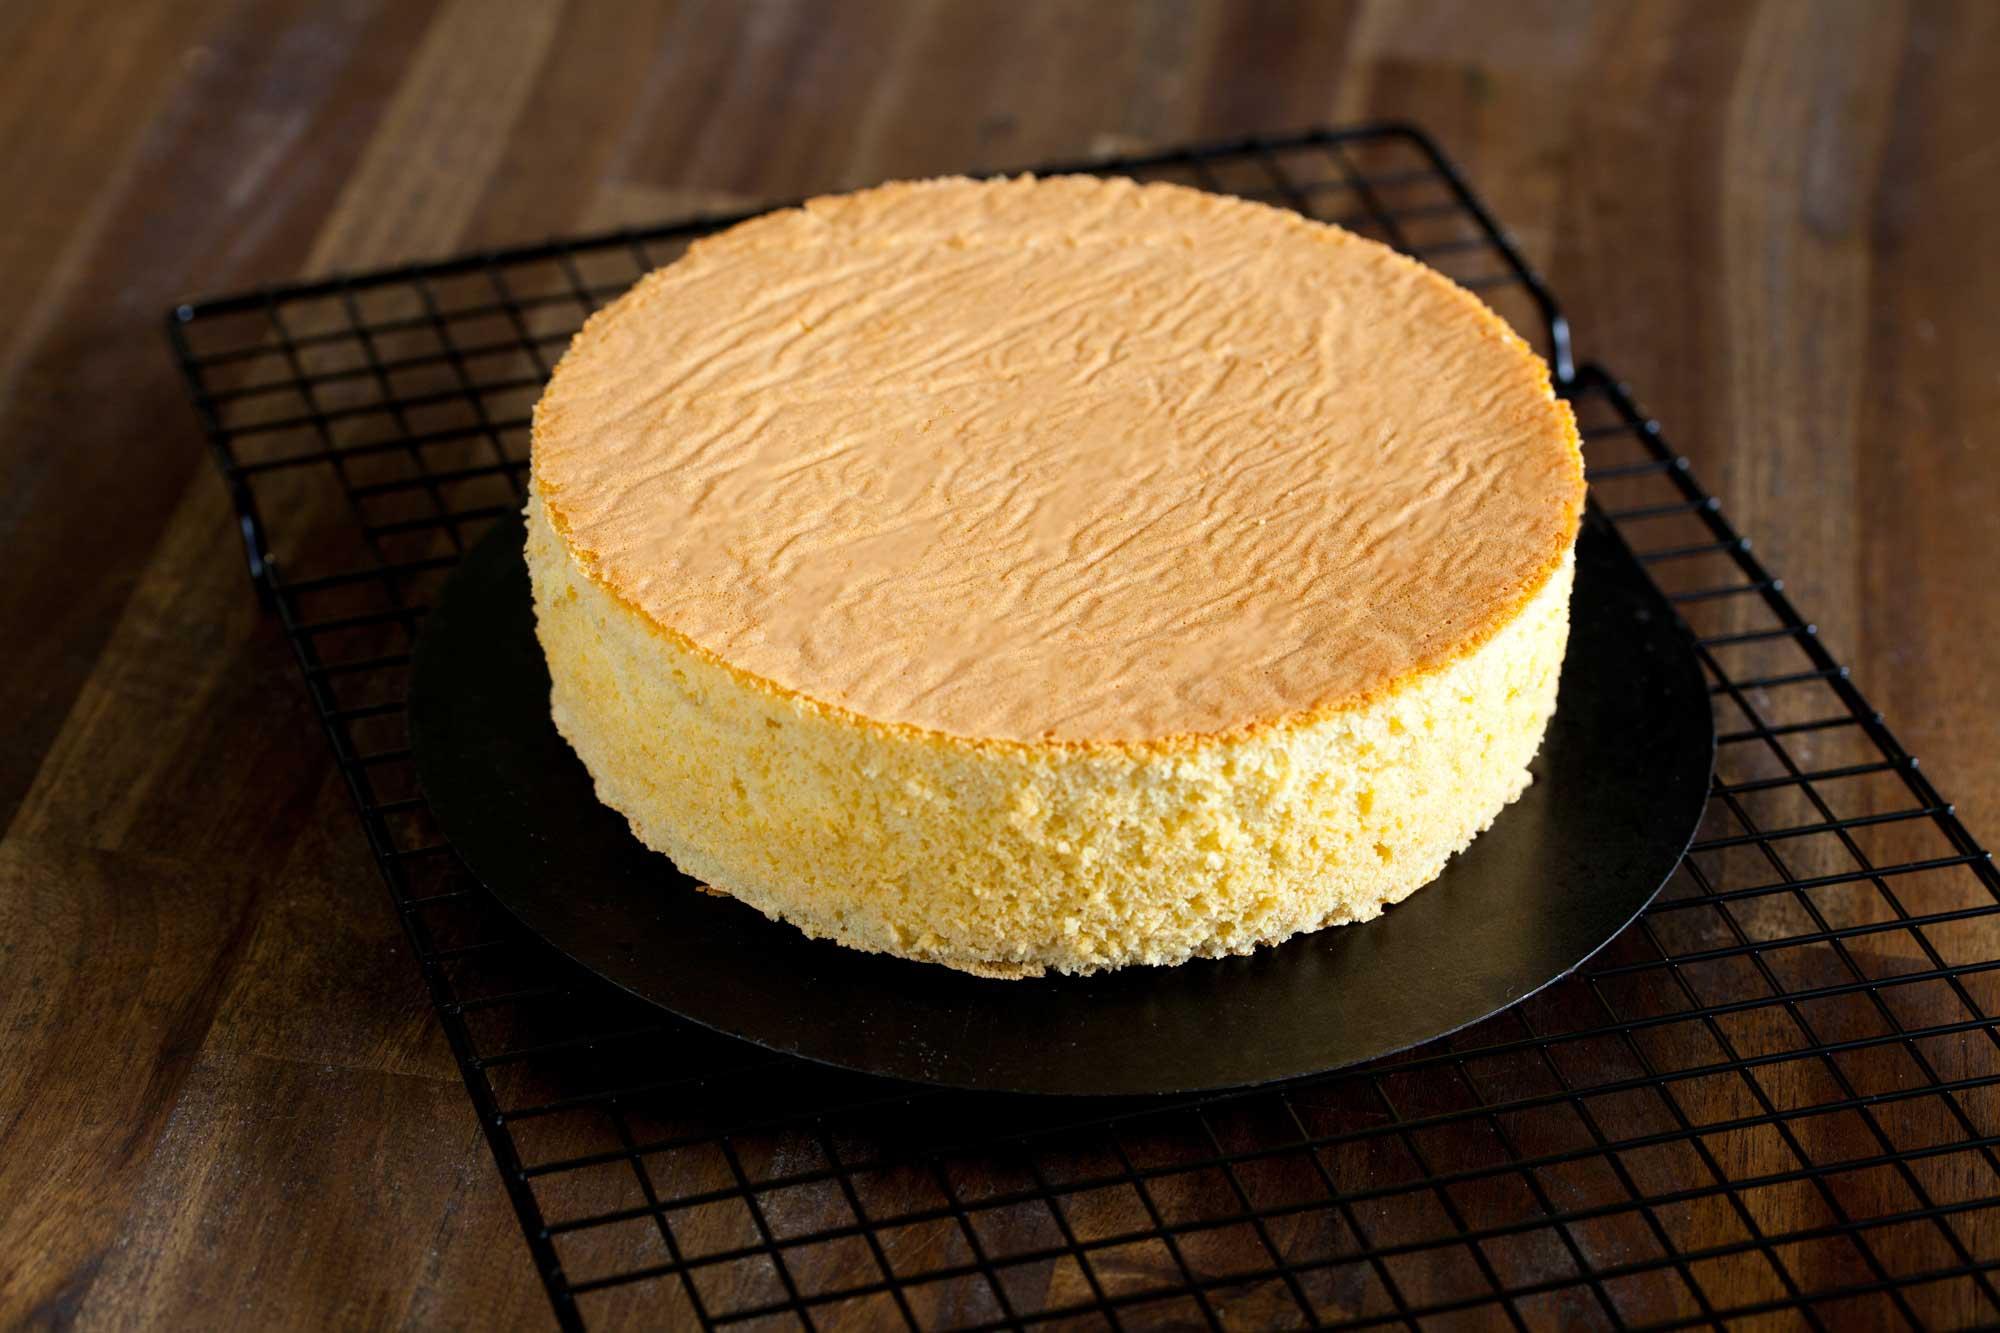 Puhast vanilijev biskvit